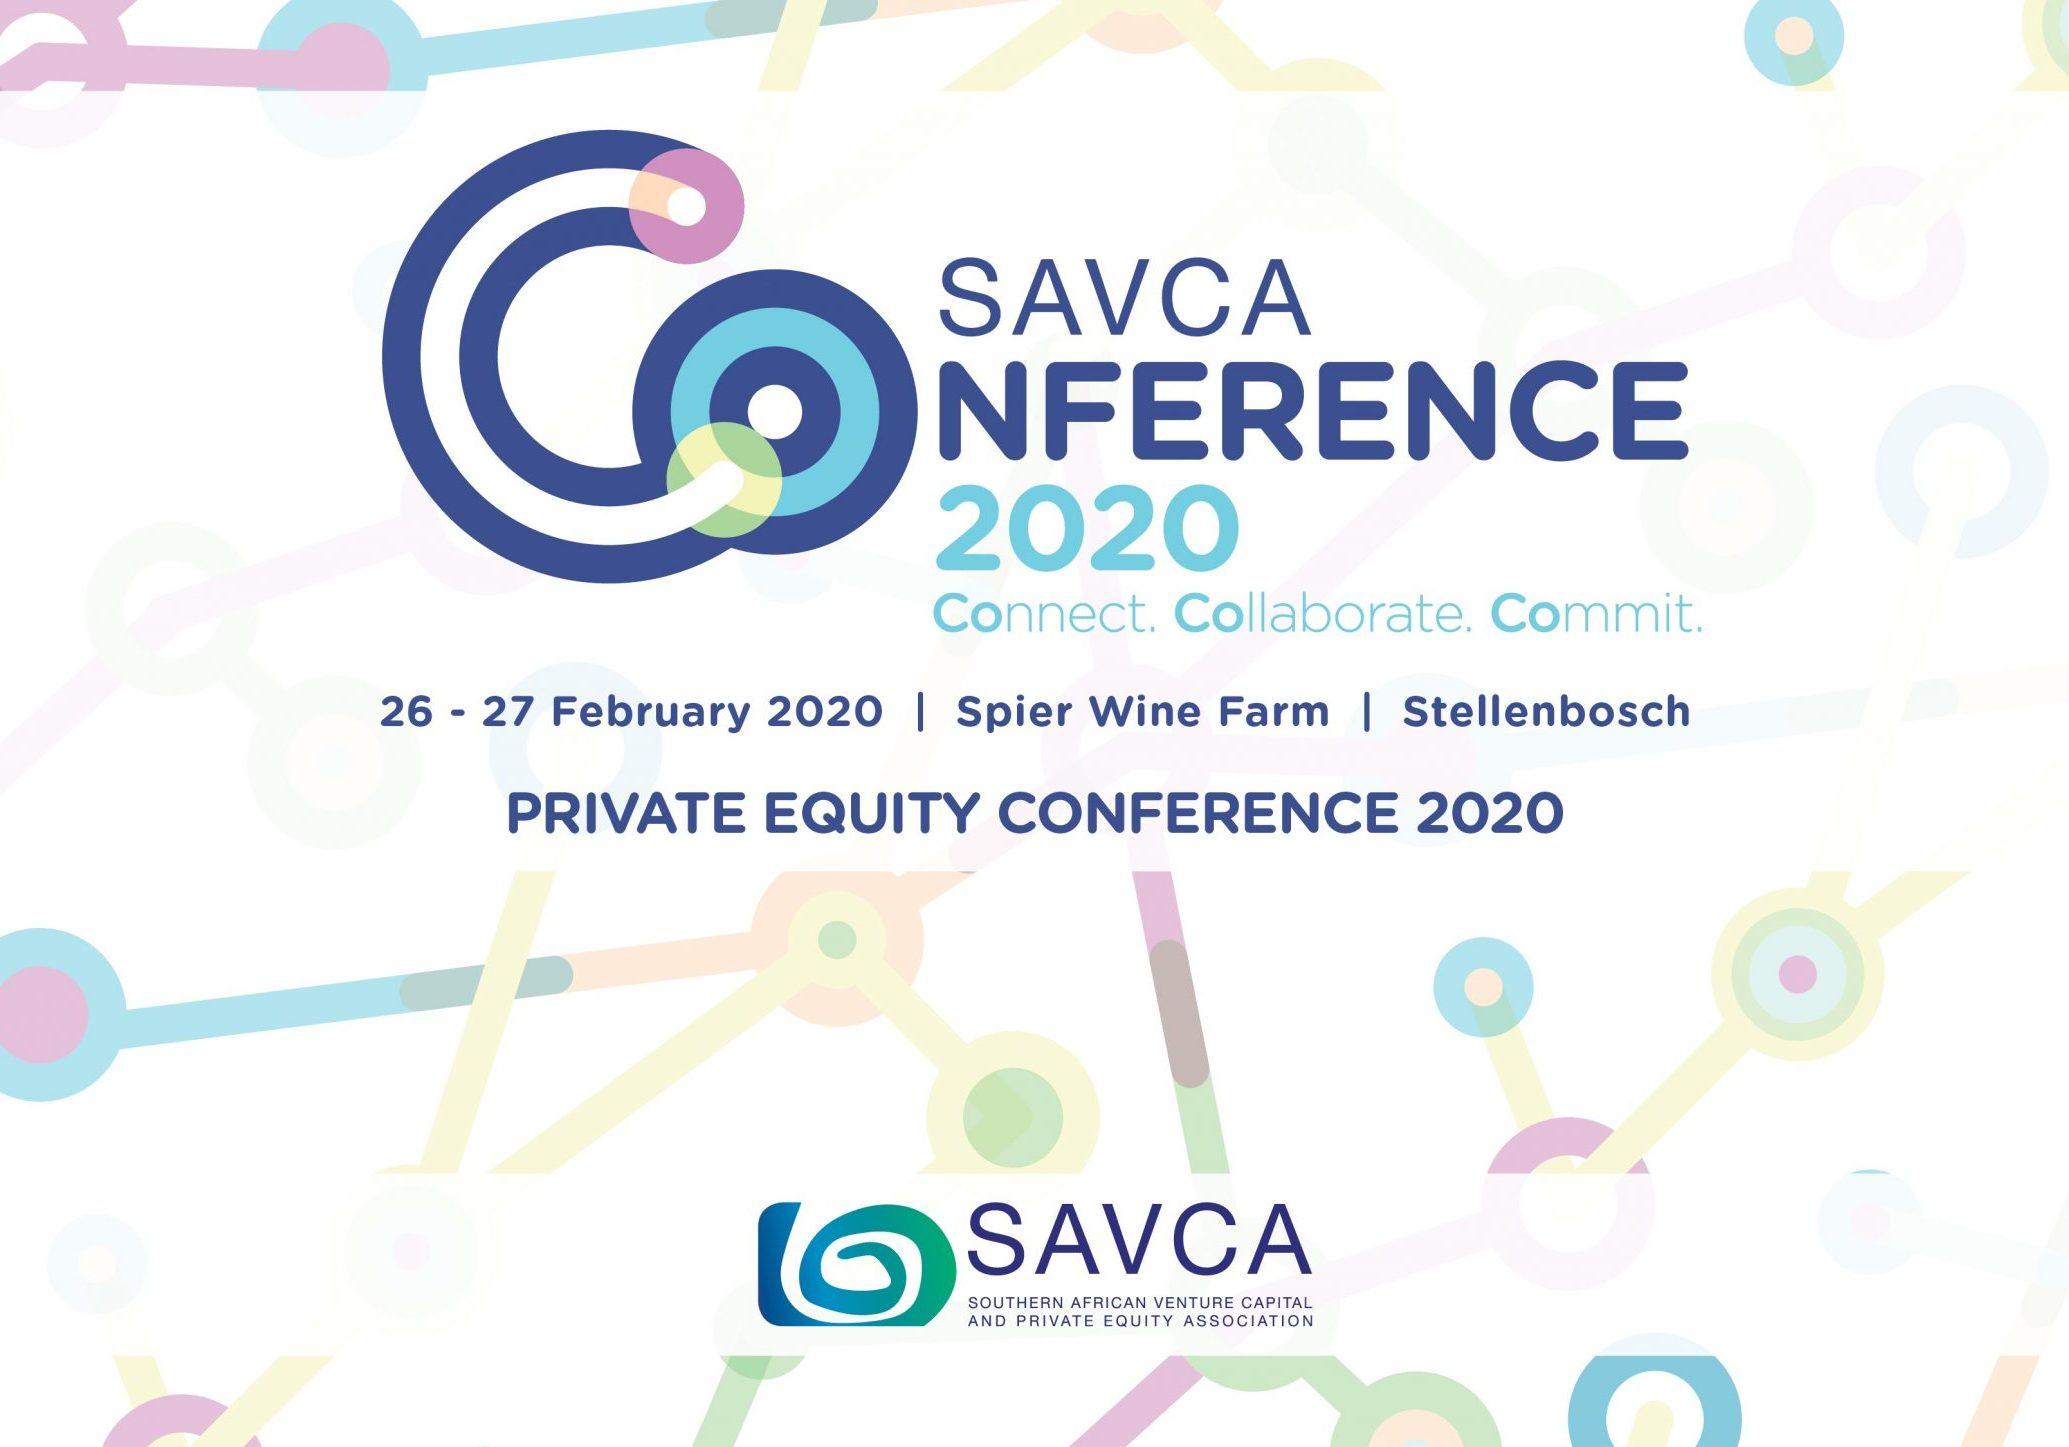 SAVCA 2020 PE Conference